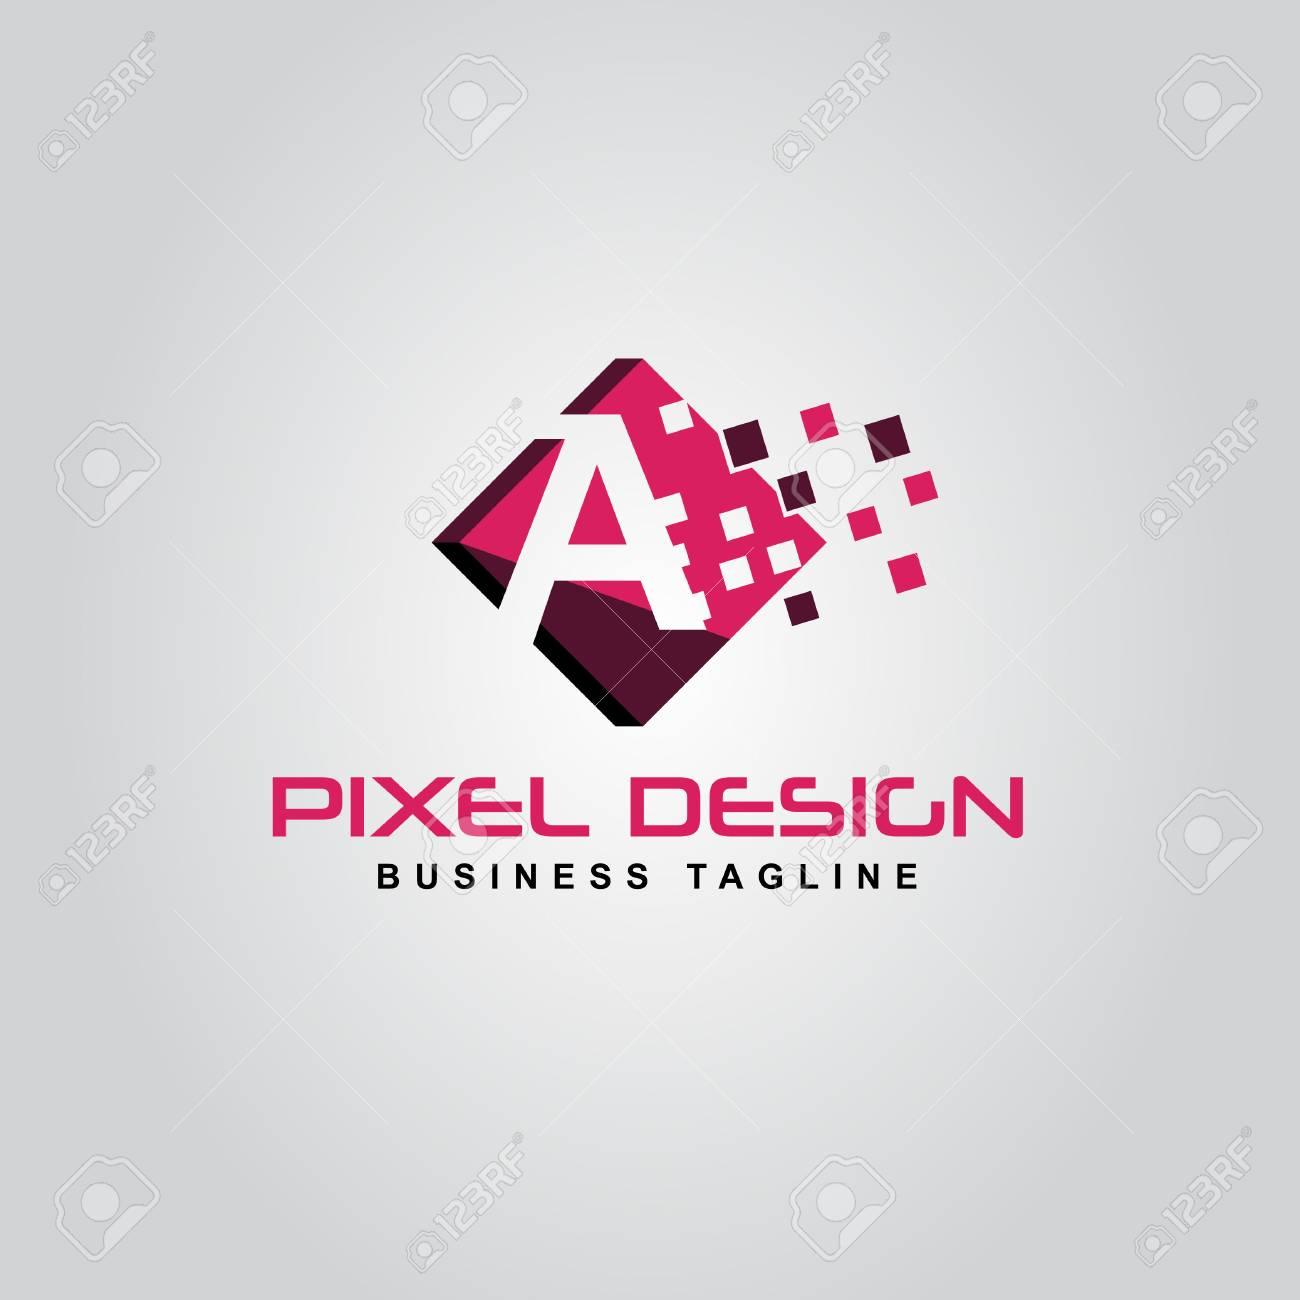 Pixel Logo Design Of The A Letter Logo A Pixel Logo Modern